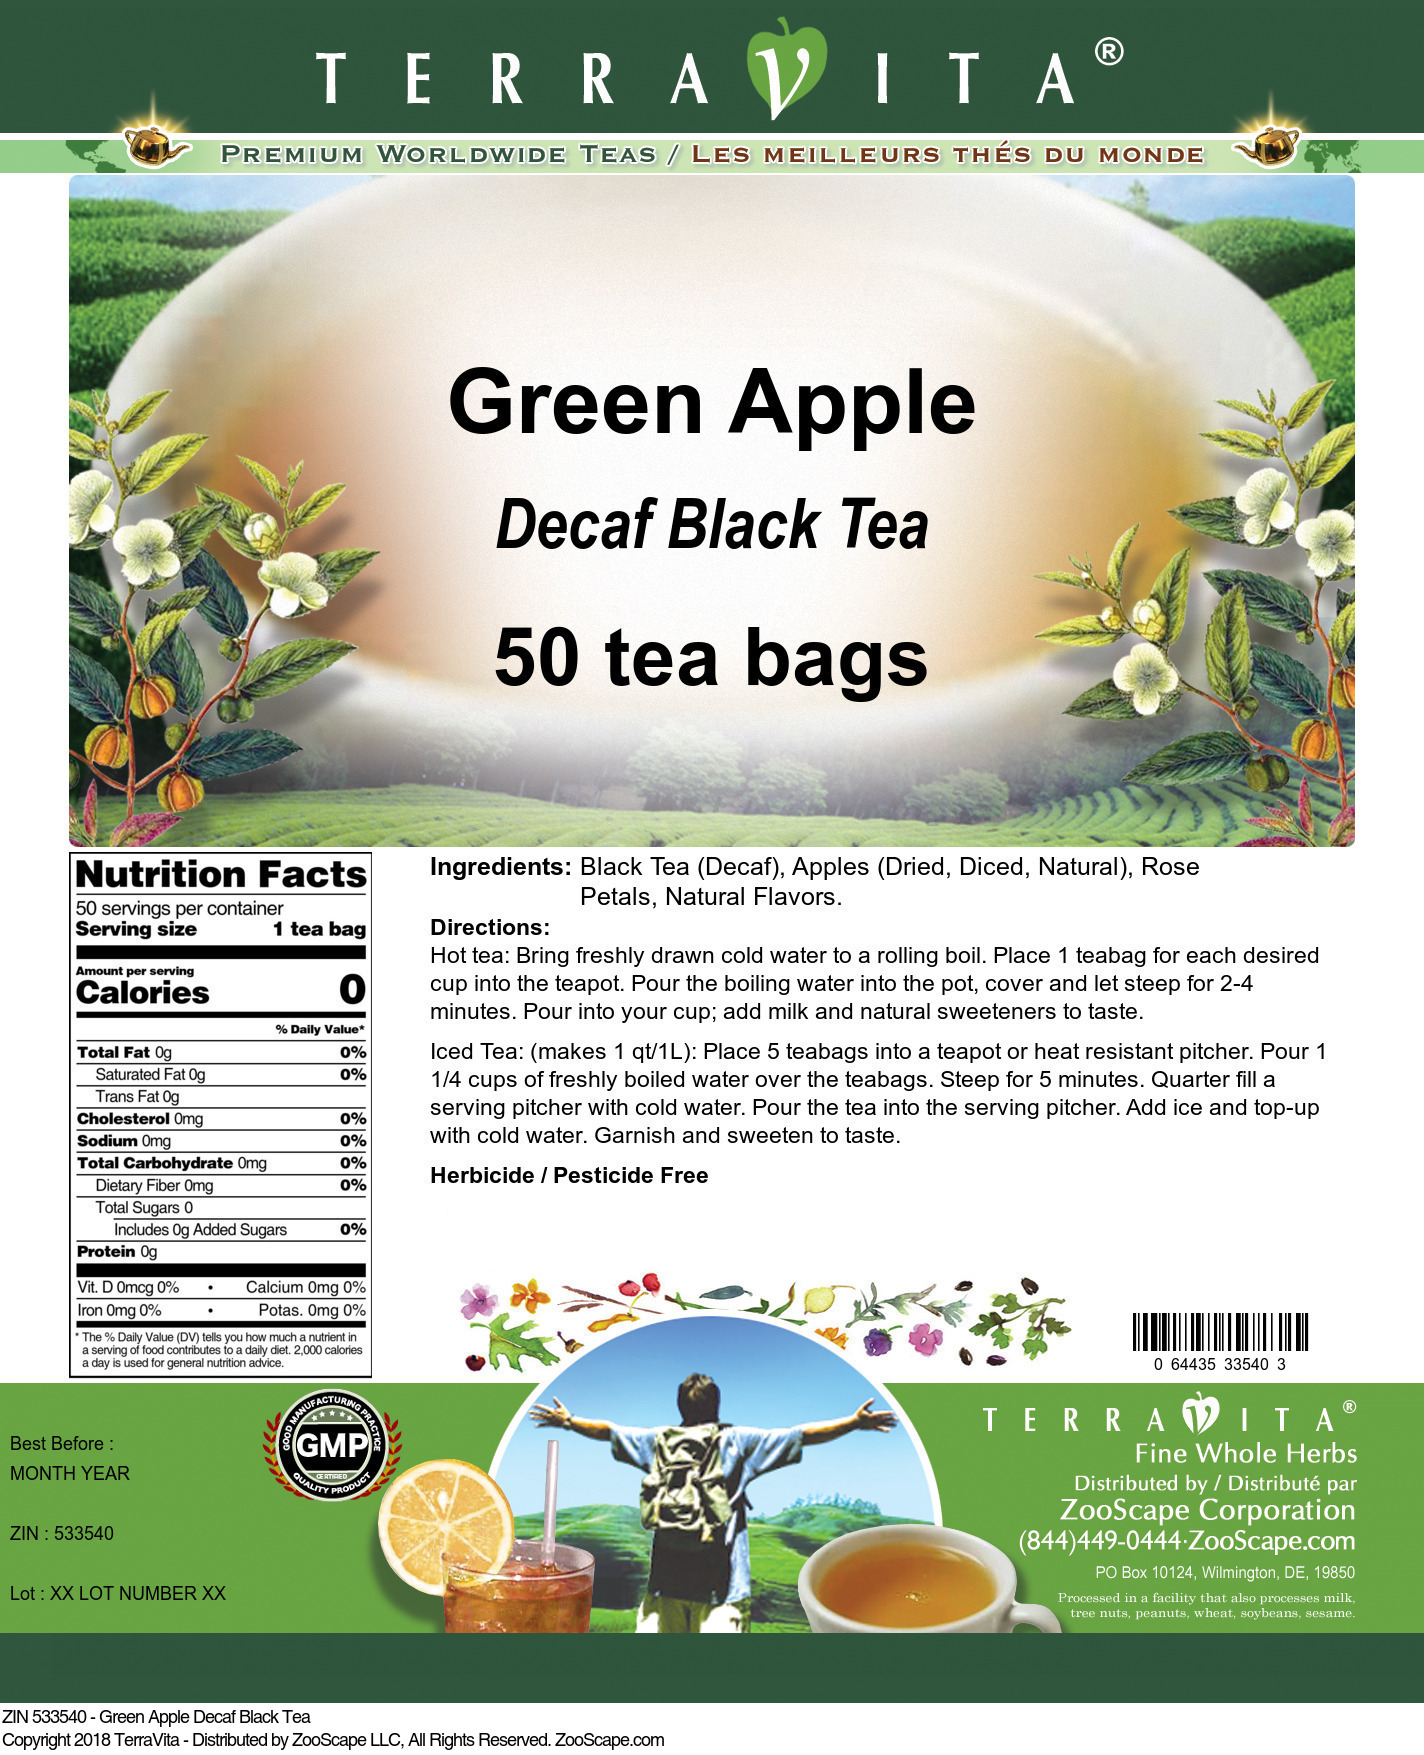 Green Apple Decaf Black Tea